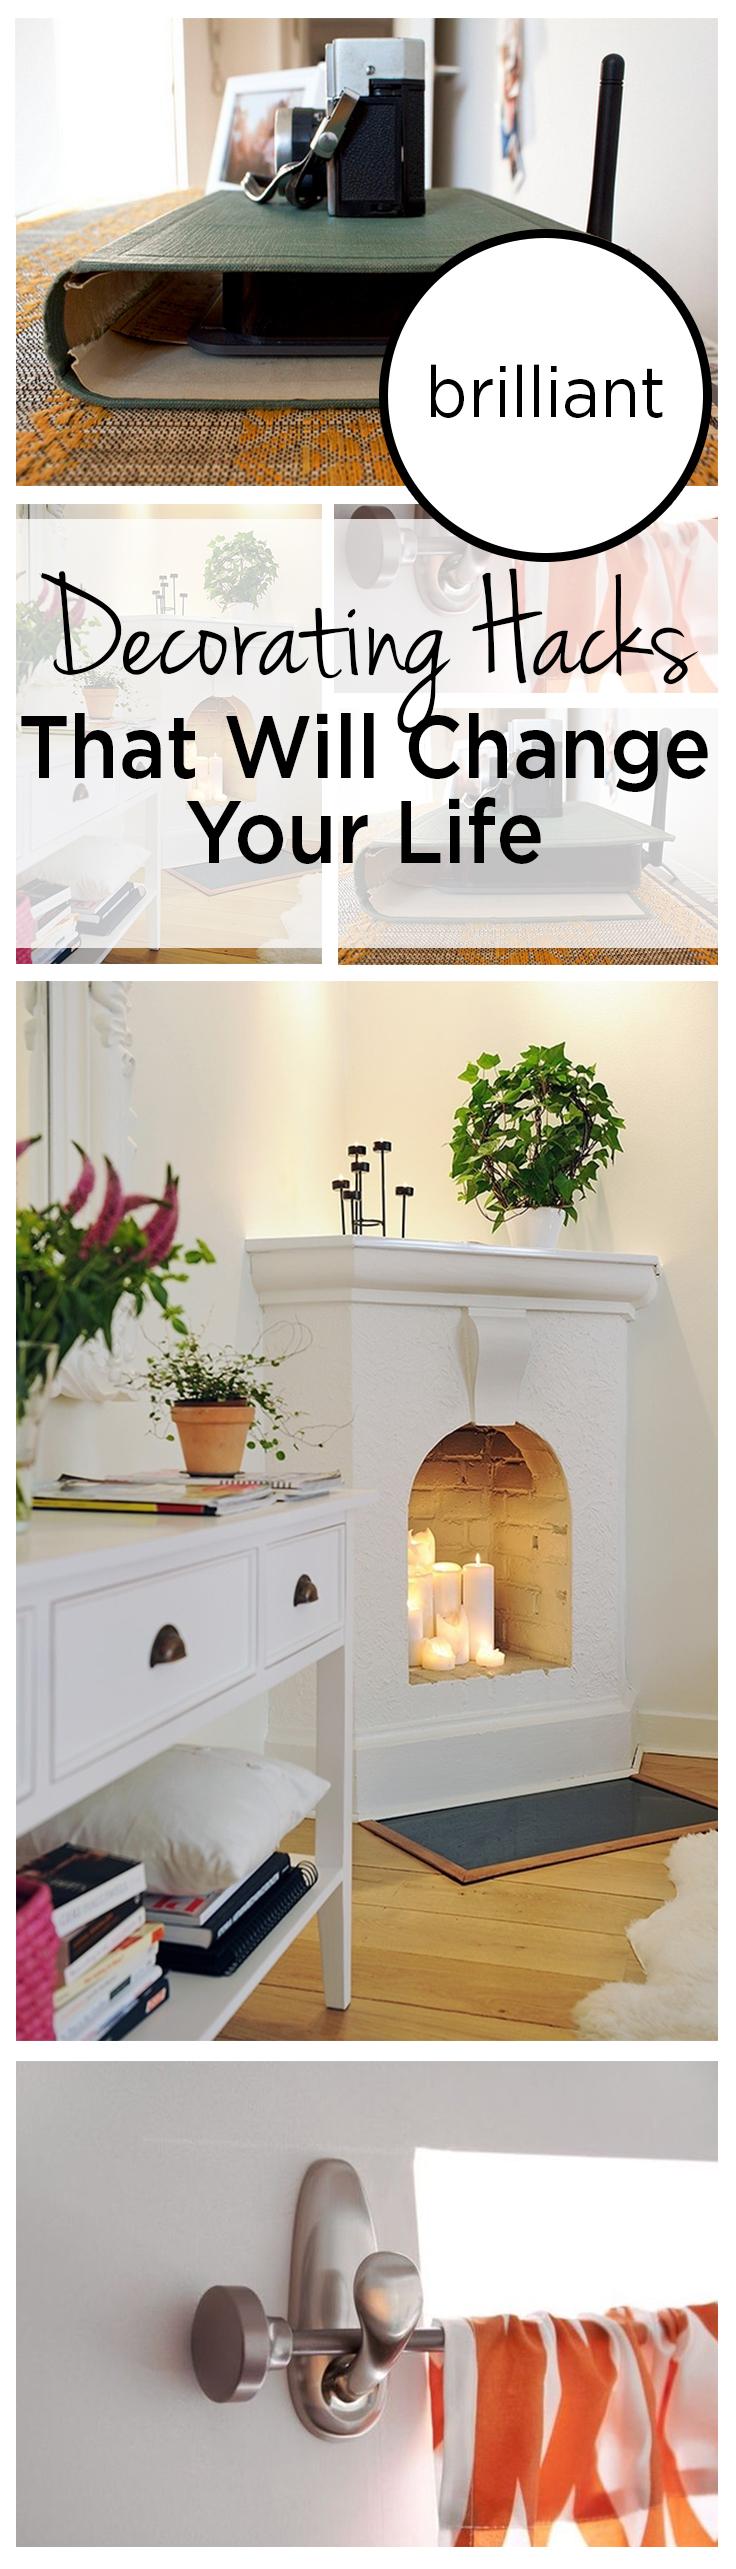 Decorating Hacks, Home Decor, Home Decorating, Home, Popular Pin, Decorating  Tips